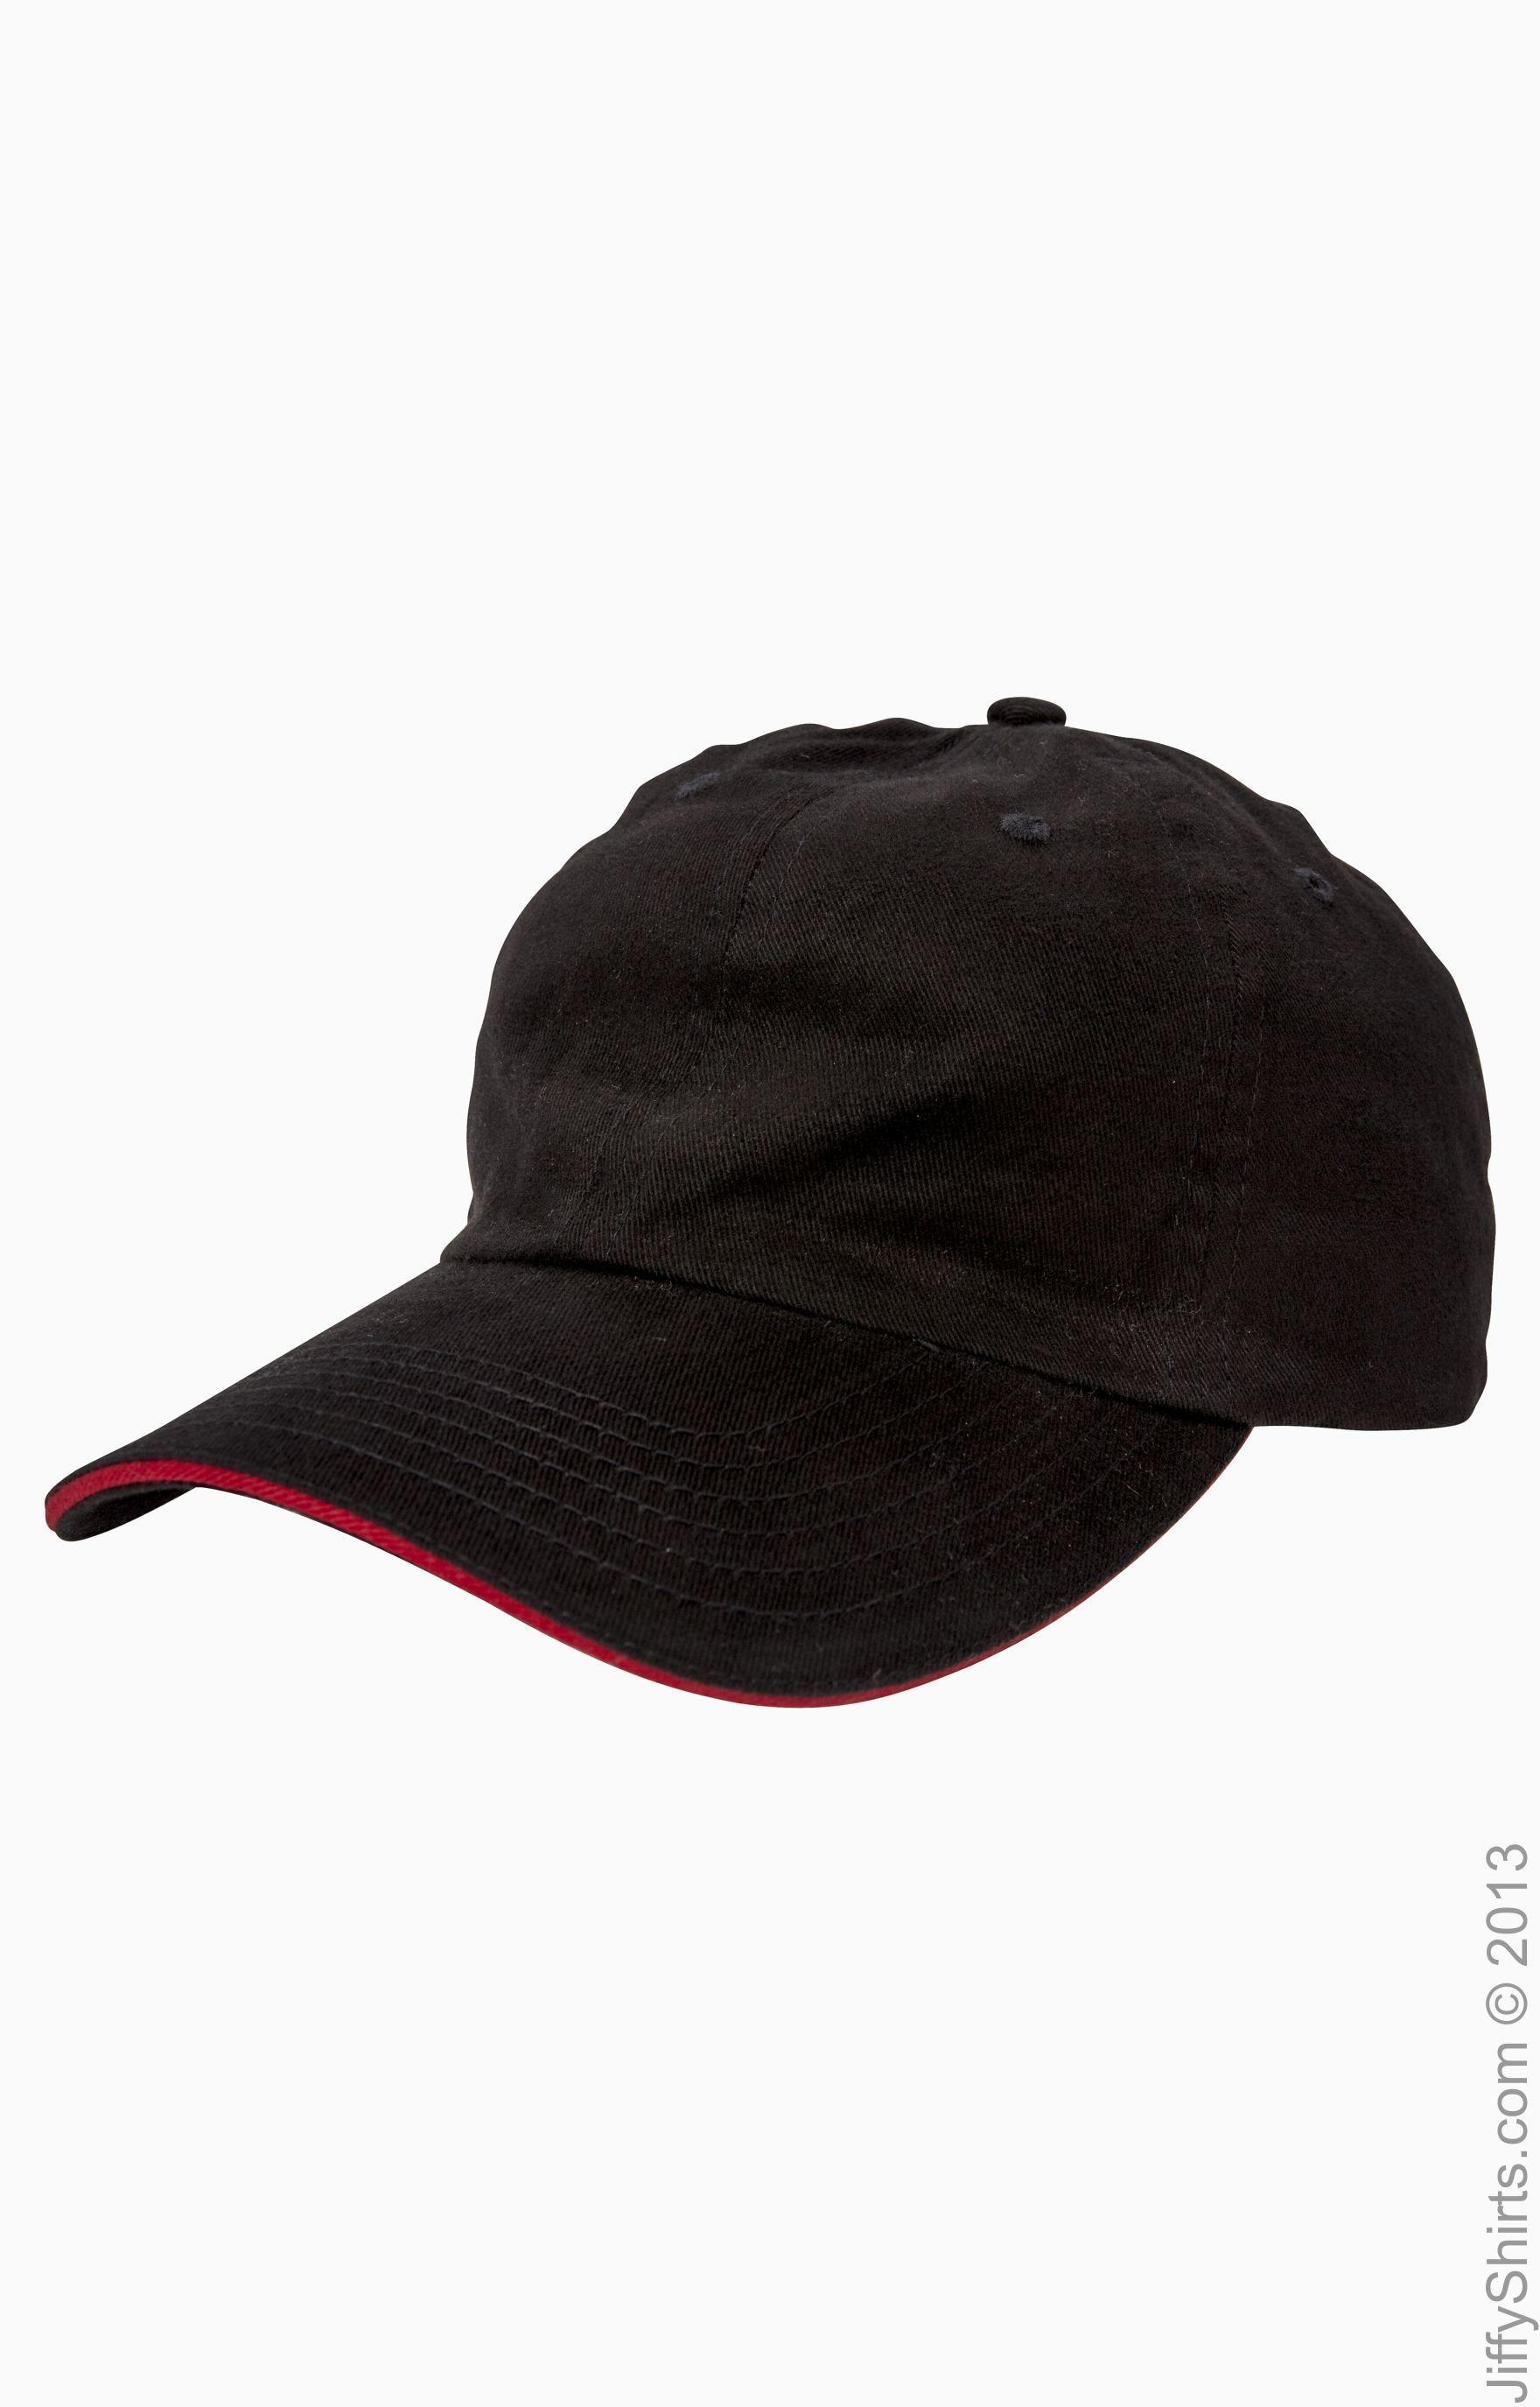 BX001S - Black/Red